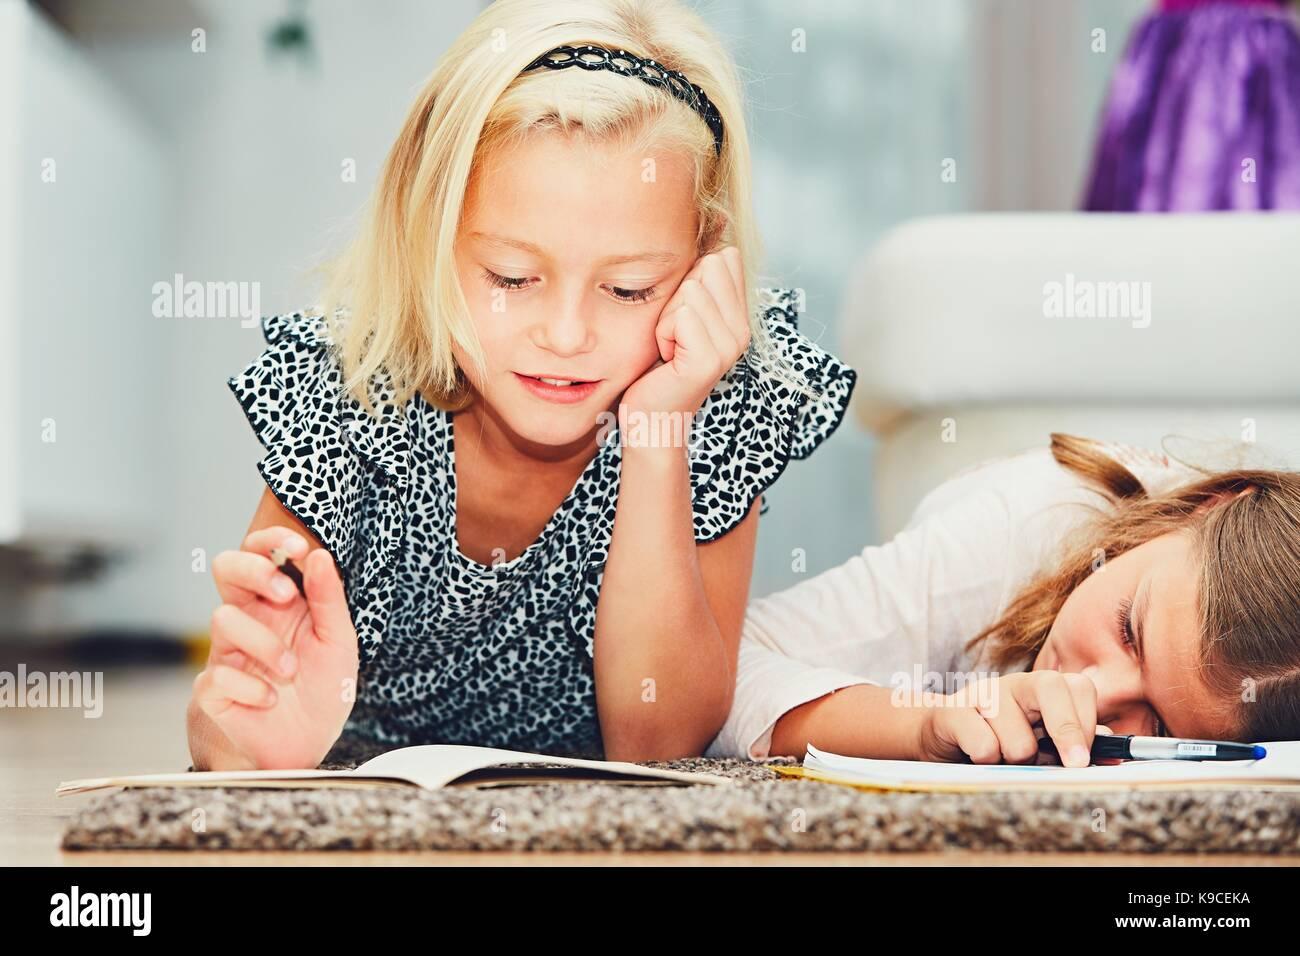 Girls lying on the carpet making their homework in elementary school. - Stock Image